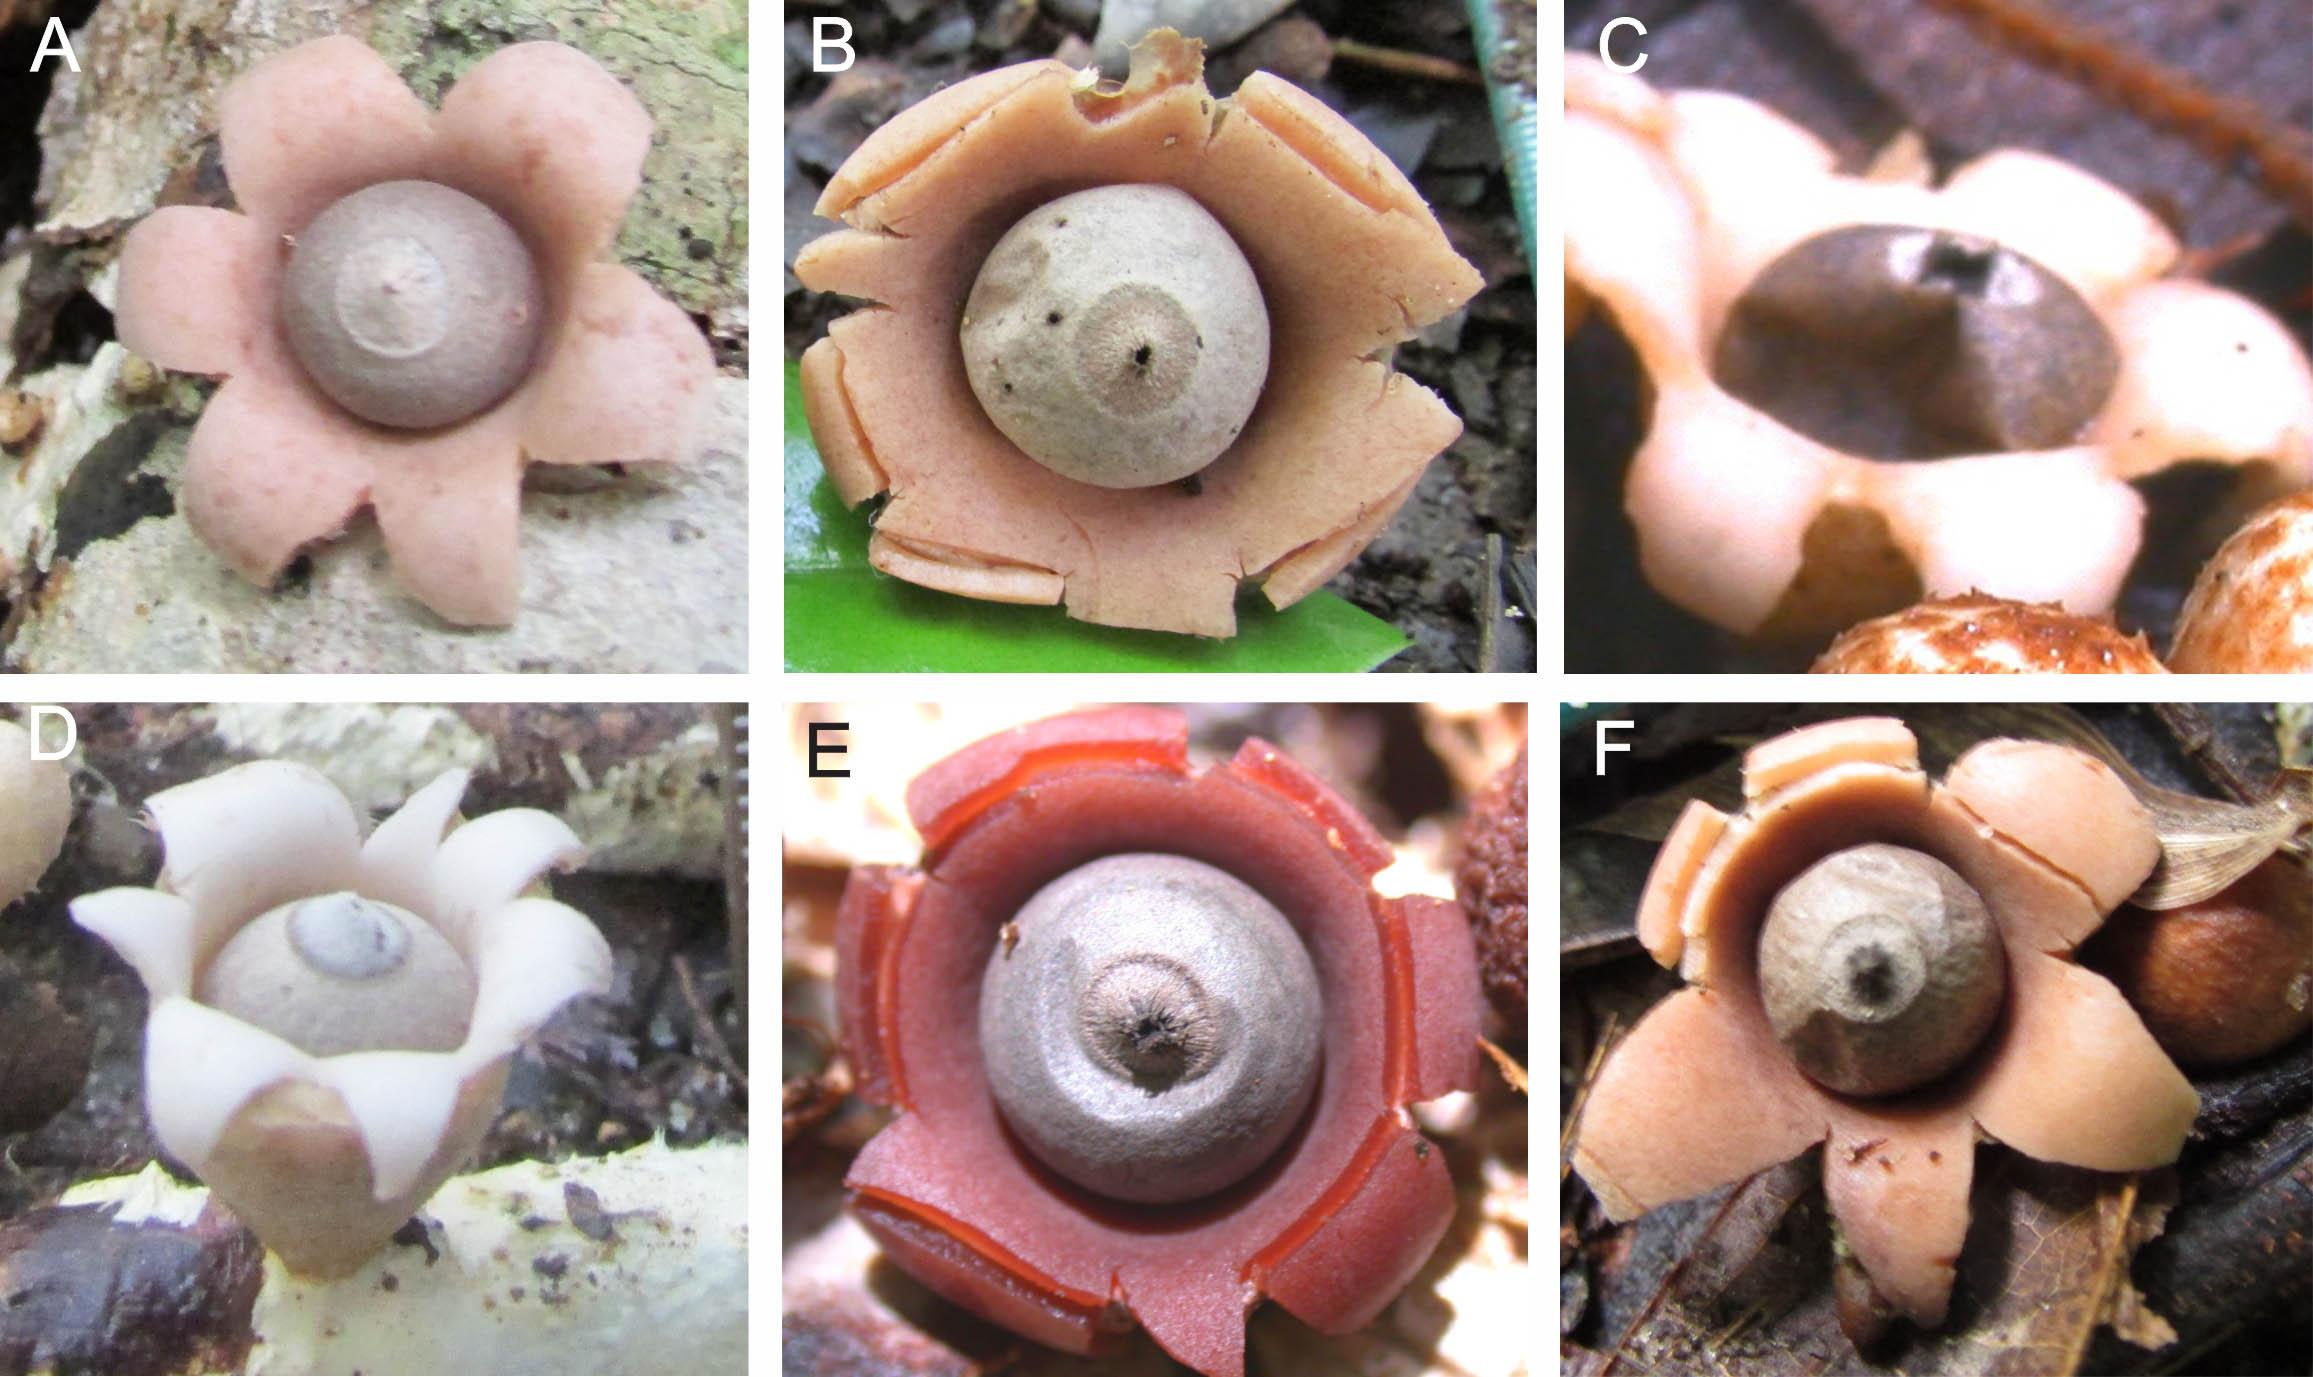 Cuerpos fructíferos de las seis especies nuevas. A) 'Geastrum baculycristallum', B) 'G. brunneocapillatum', C) 'G. courtecuisse', D) 'G. neoamericanum', E) 'G. rubellum', F) 'G. rubropusillum'. Imagen: J.O. Sousa / CSIC